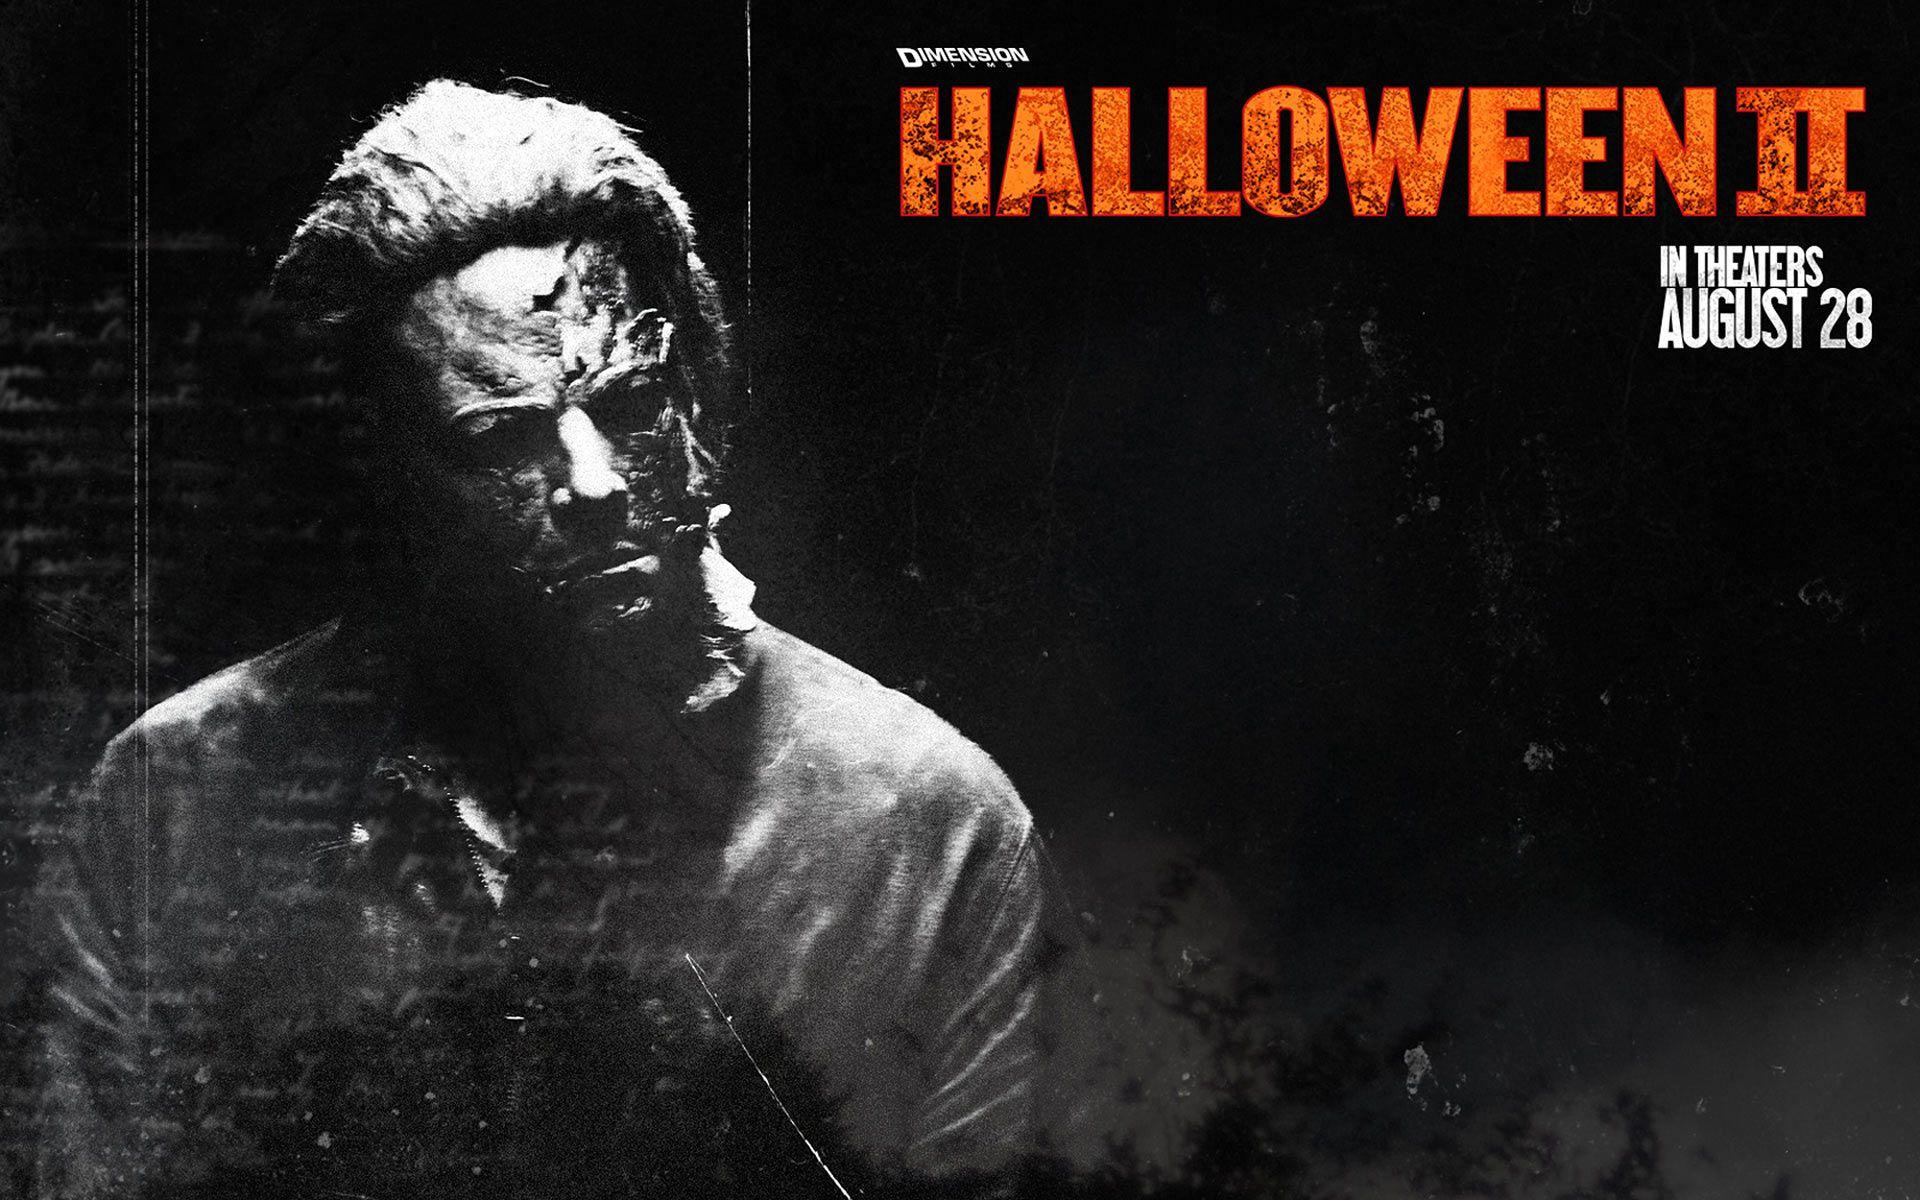 Halloween Movie   1920x1200 Wallpaper   teahubio 1920x1200